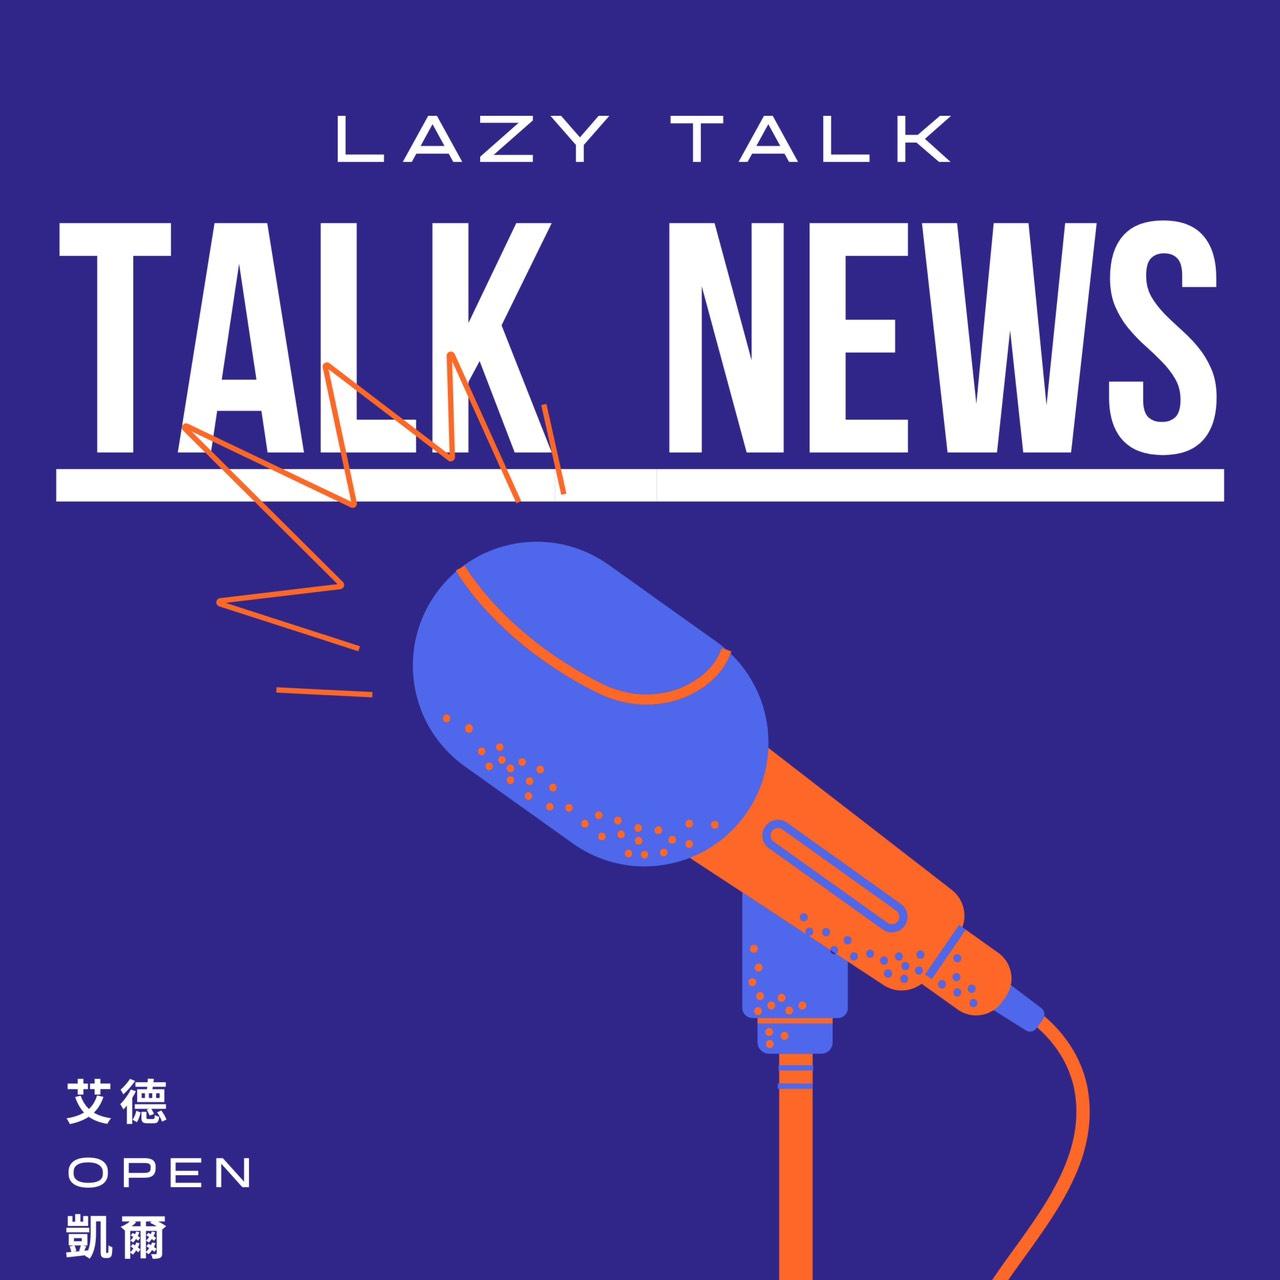 [Talk News]透時事#03 - 薪水小偷?摔破頭?撿菸頭?